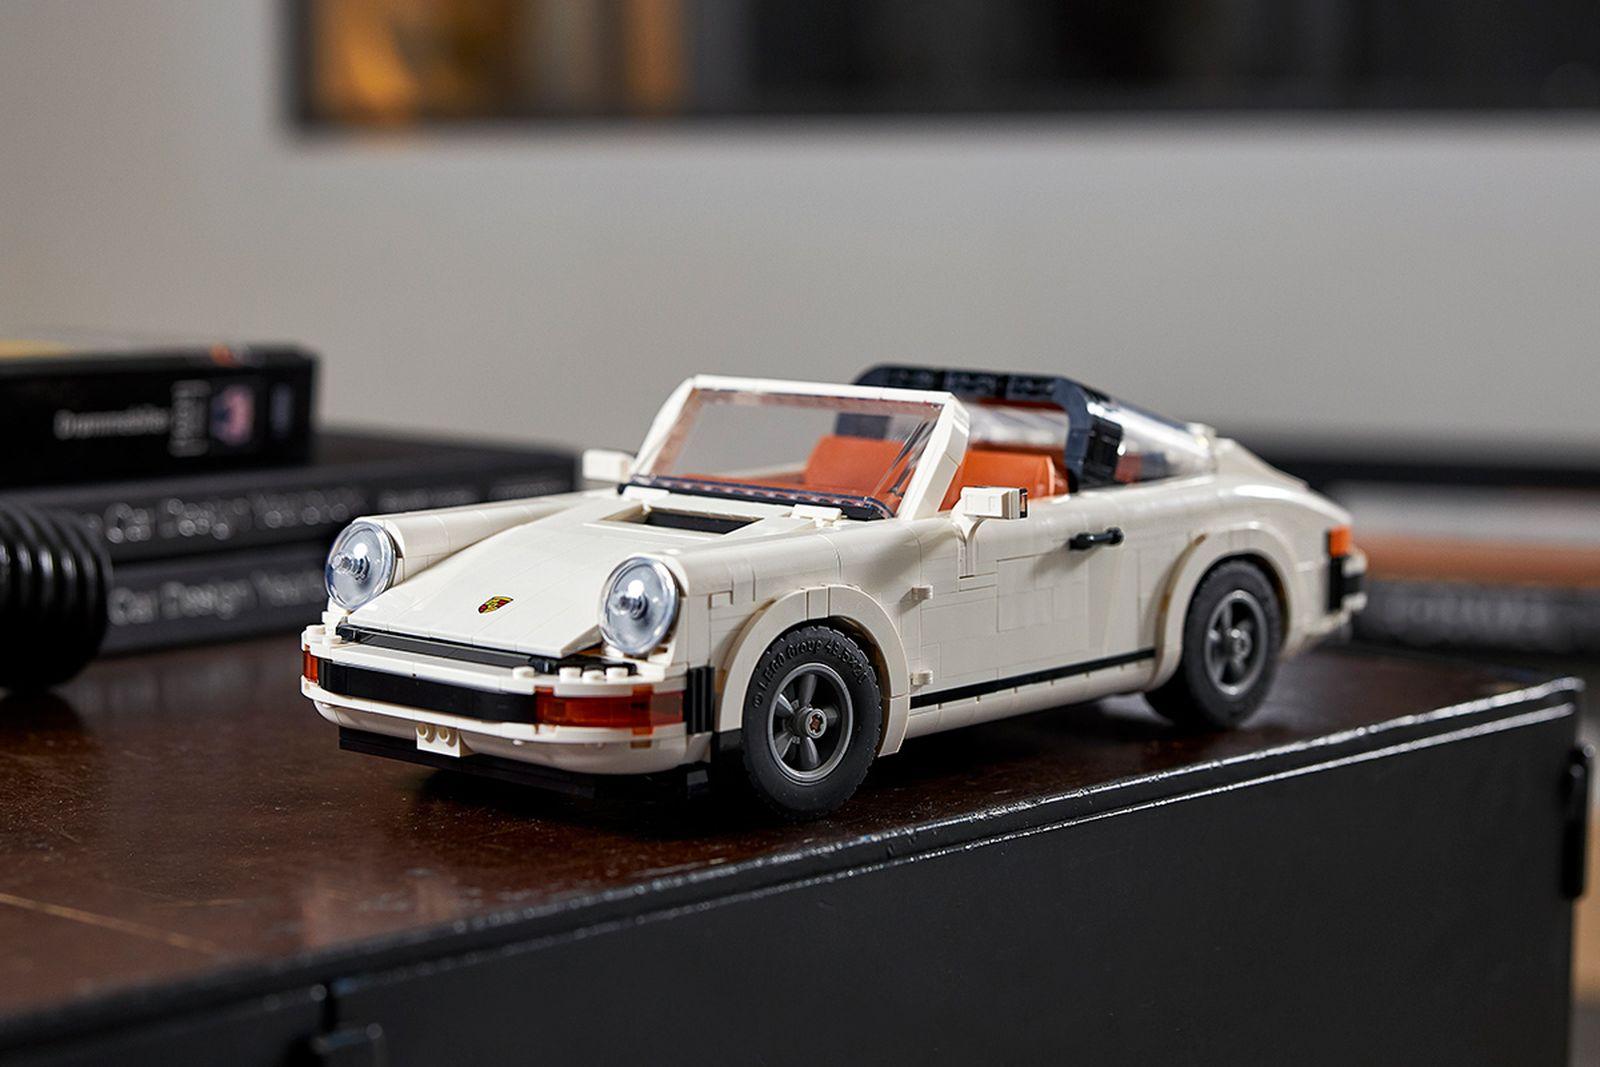 lego-porsche-911-turbo-911-targa-09